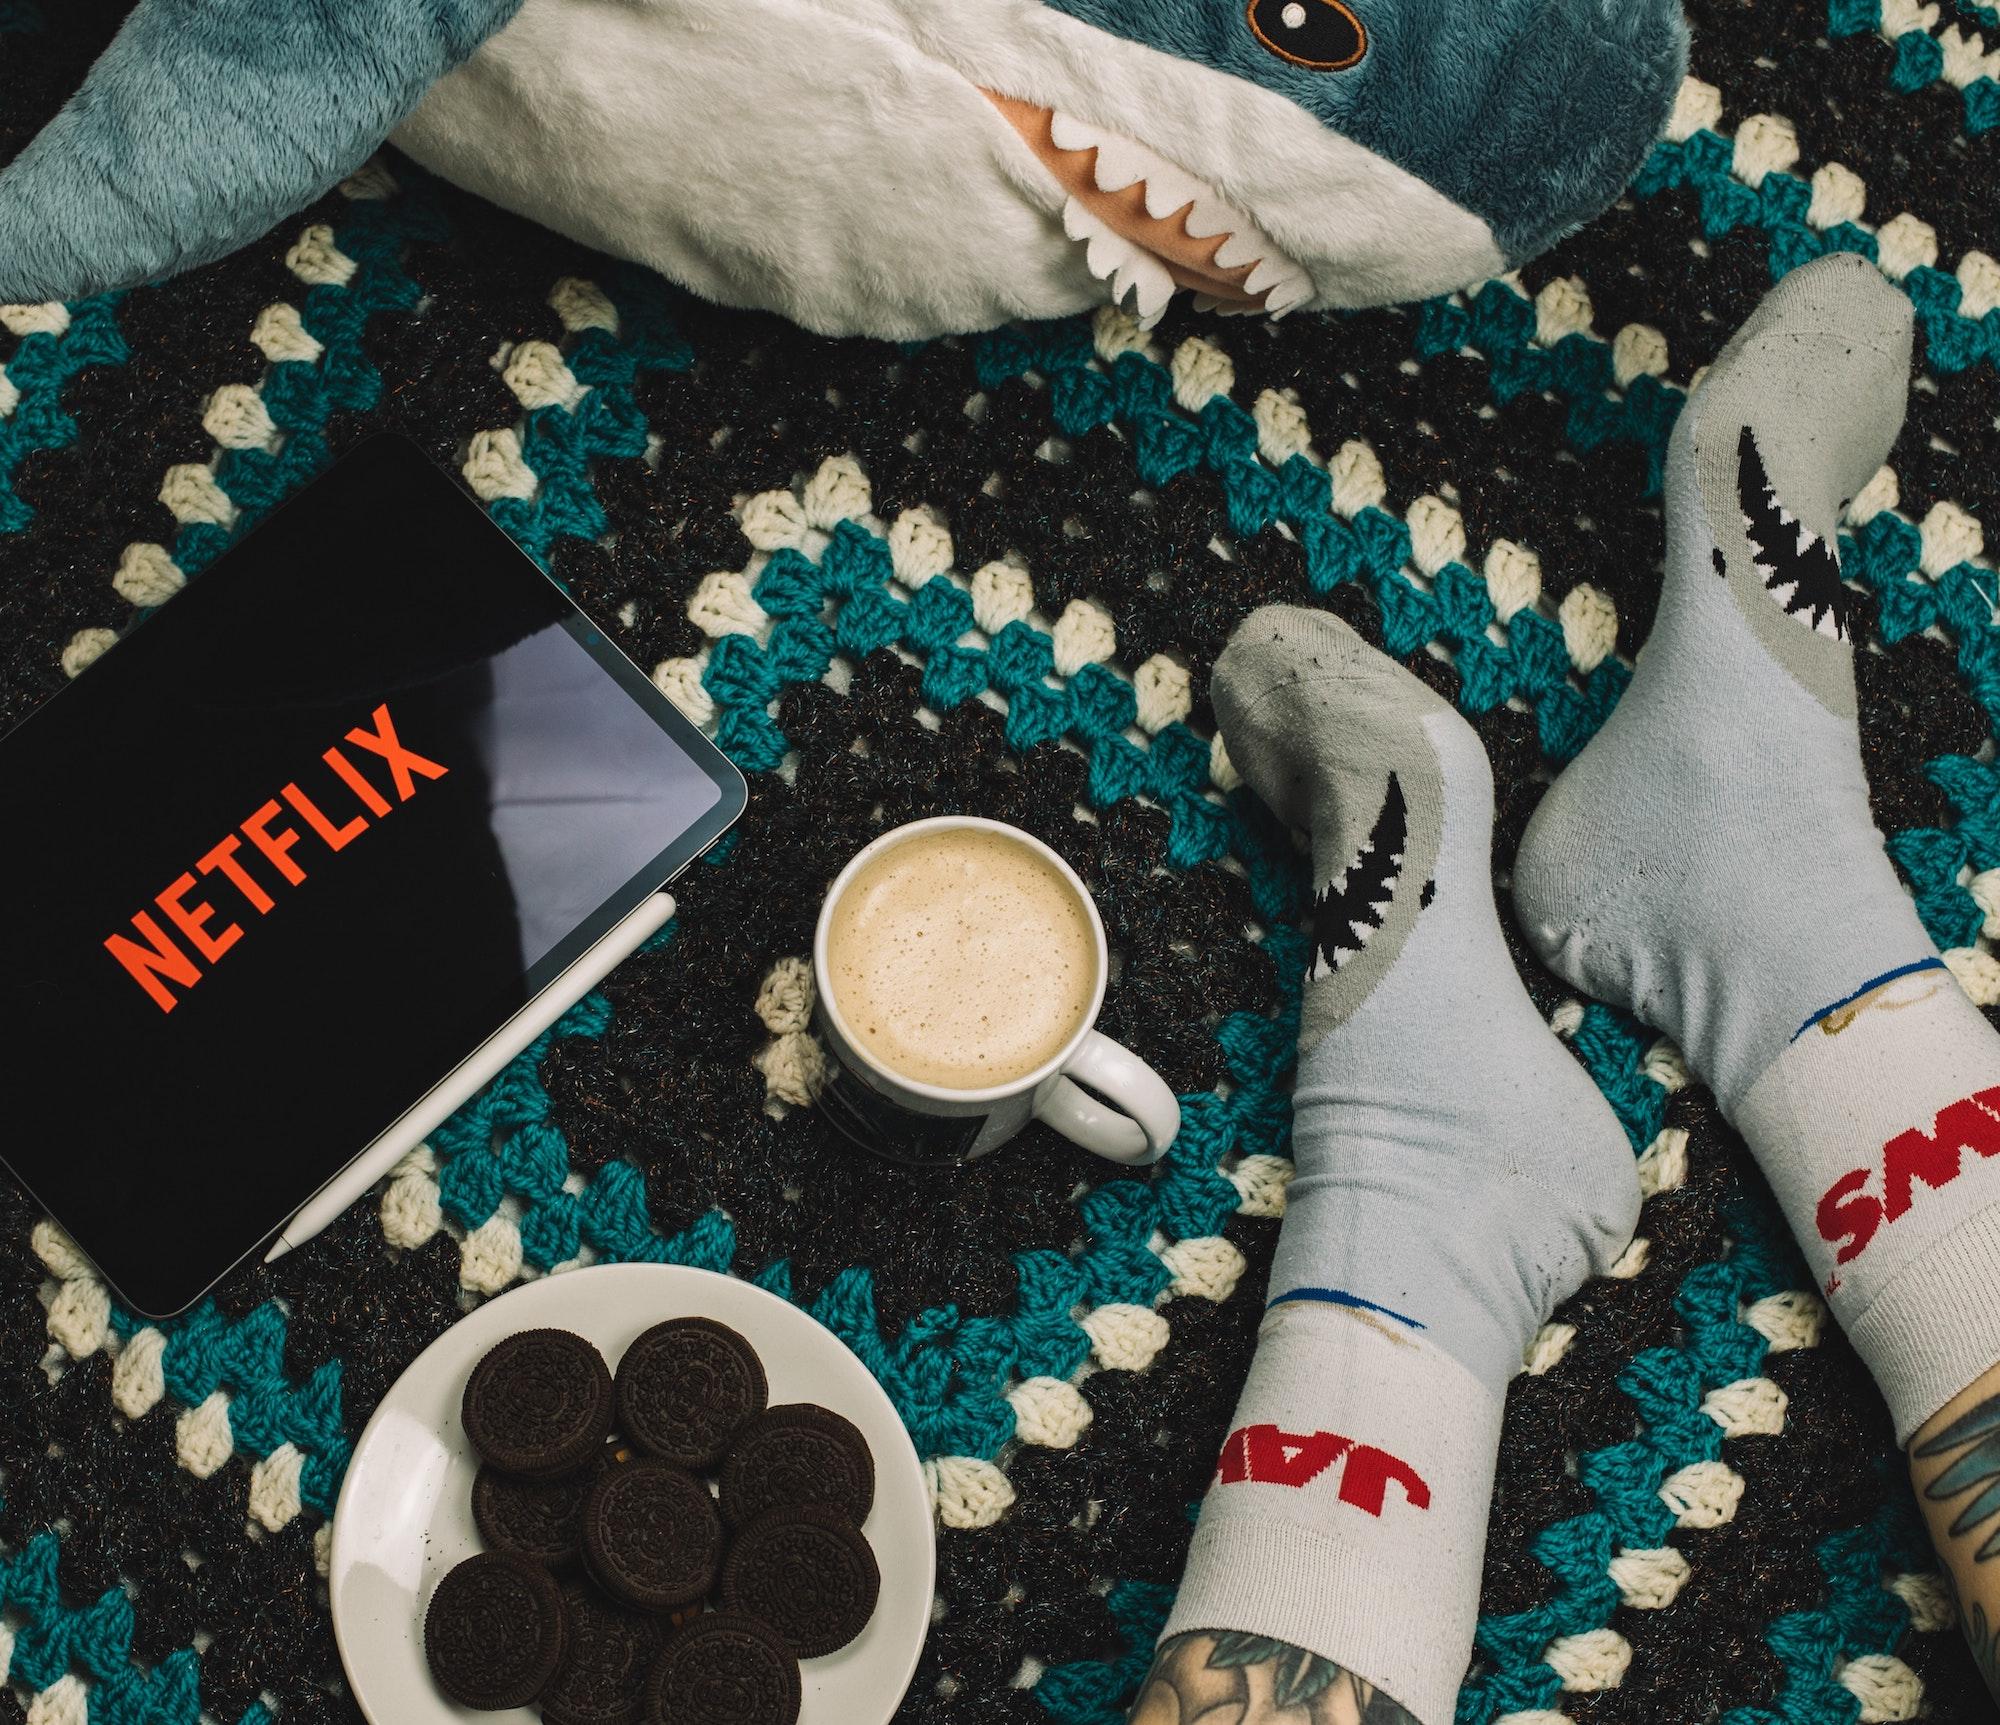 Virtual Night In How to make Netflix nights better   Technology   Elle Blonde Luxury Lifestyle Destination Blog